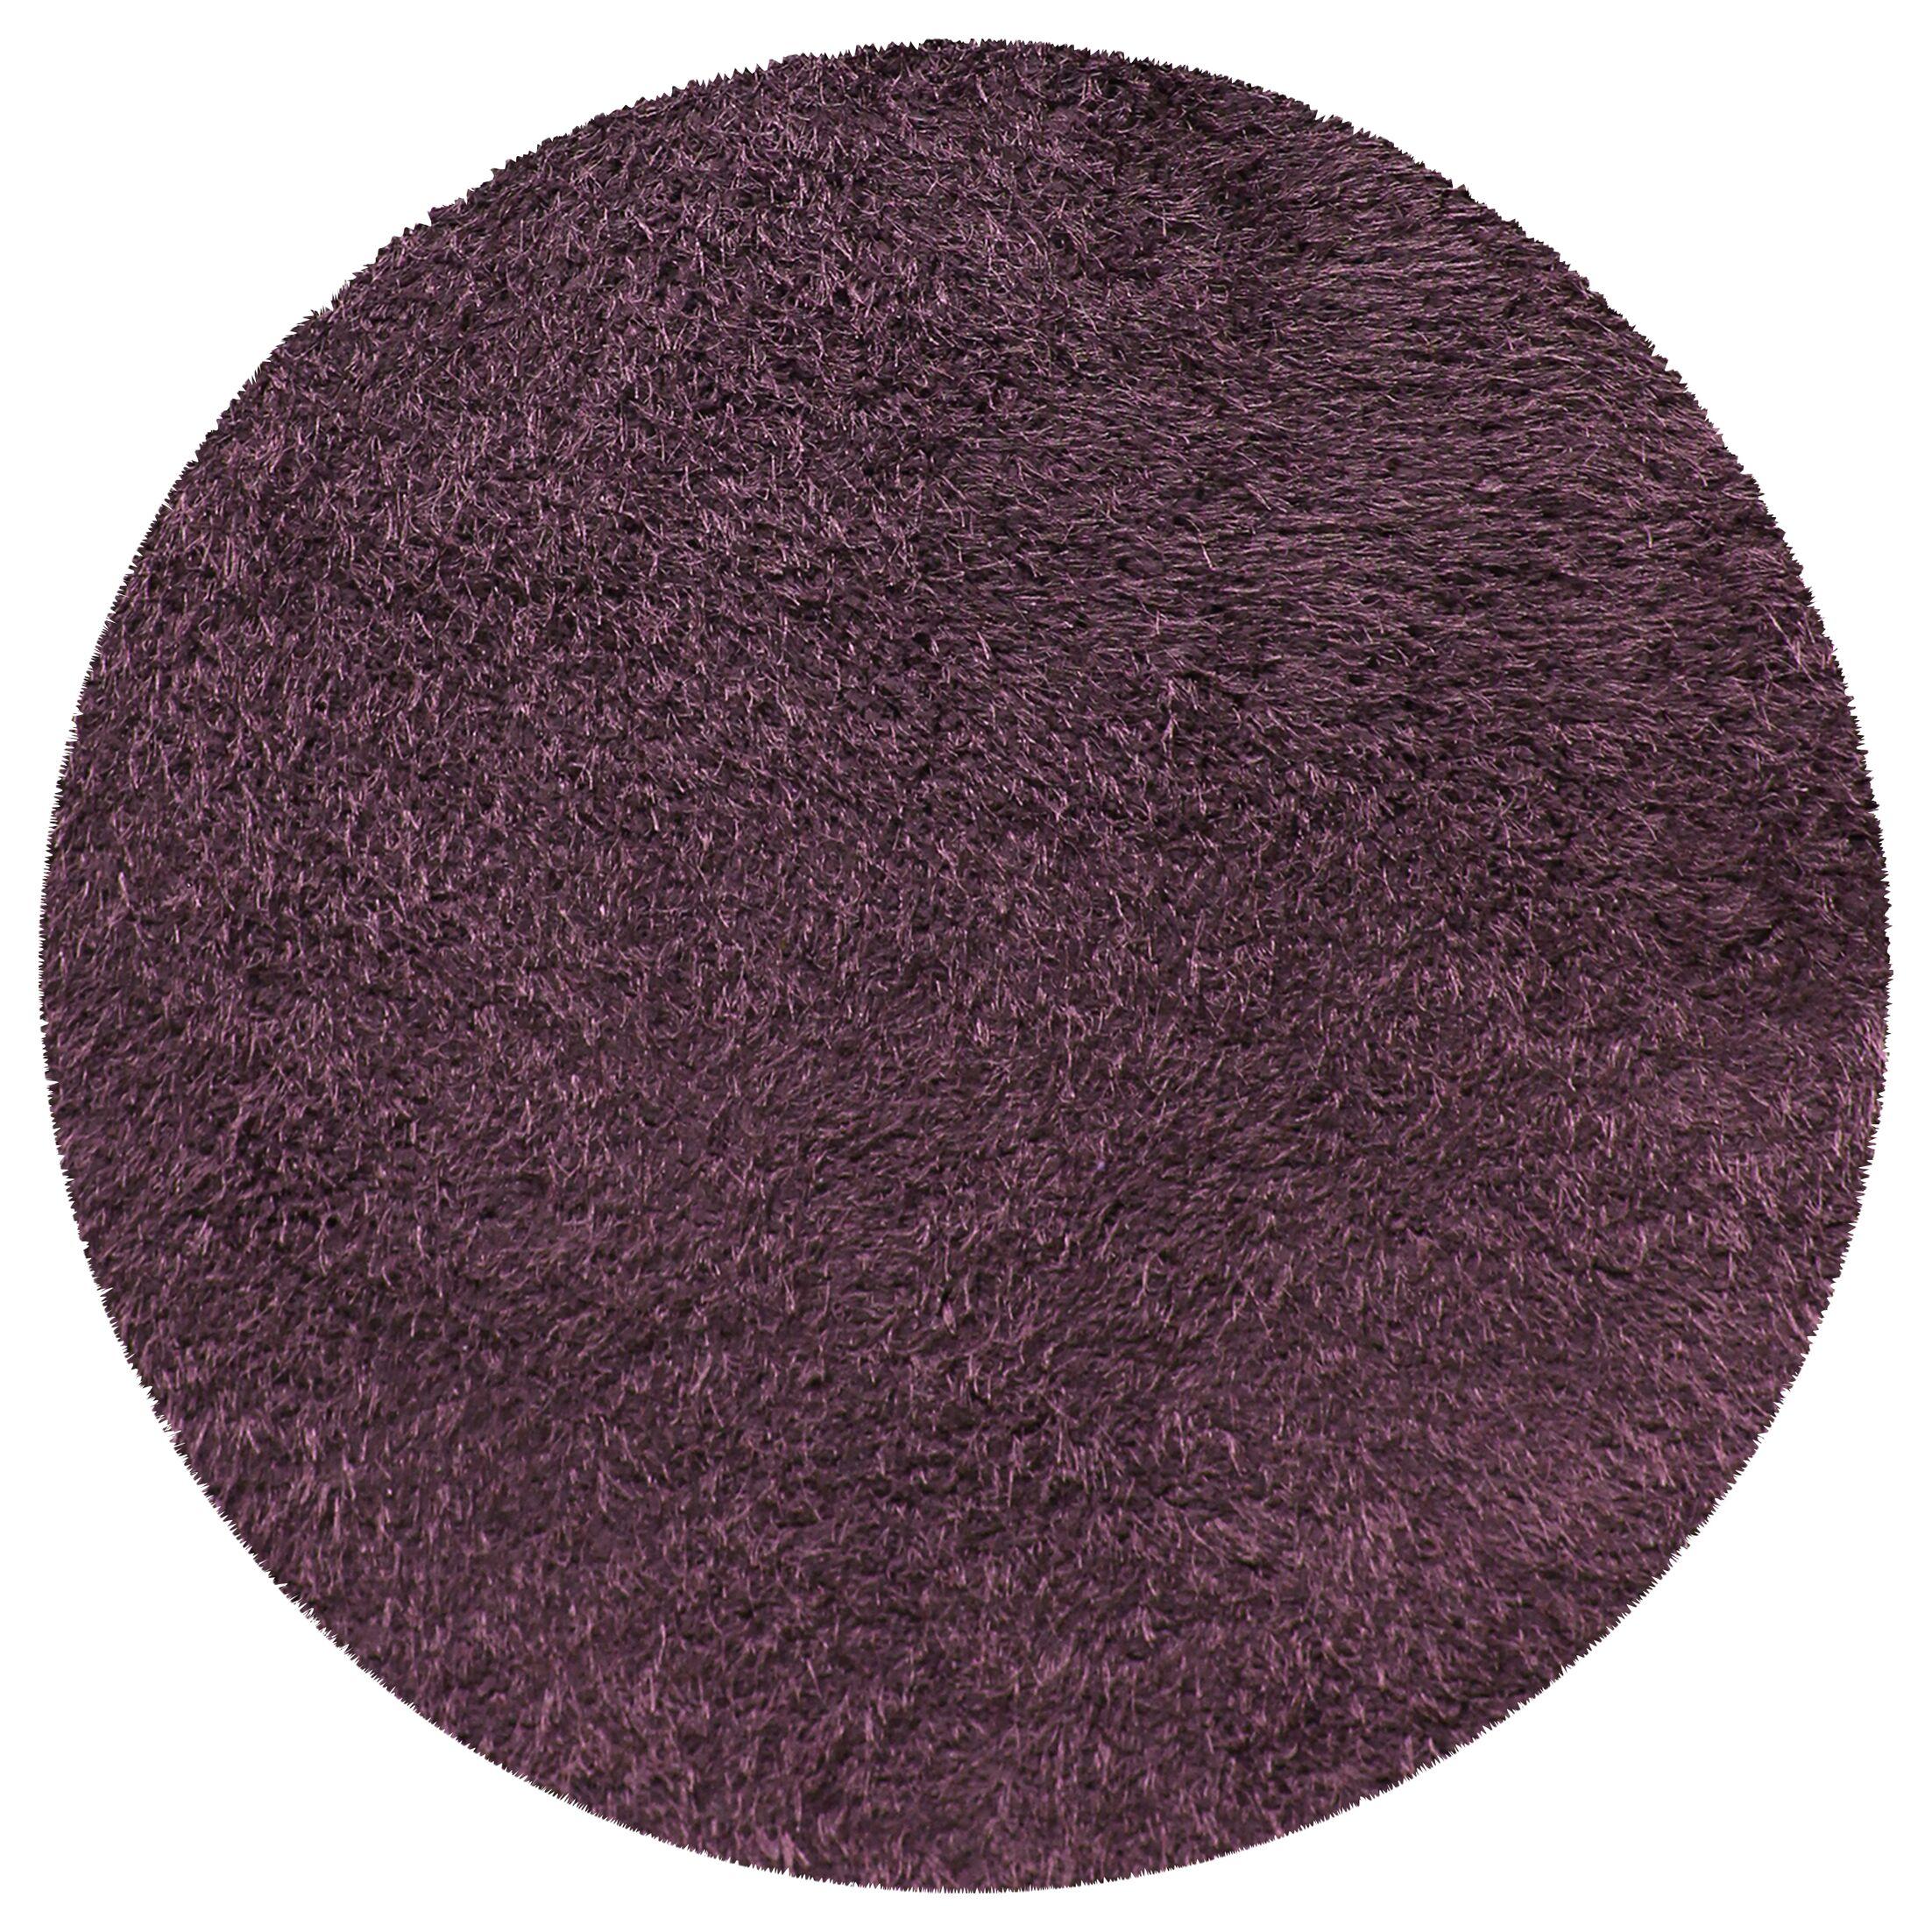 Blaisdell Shag Hand Woven Purple Area Rug Rug Size: Round 6'6